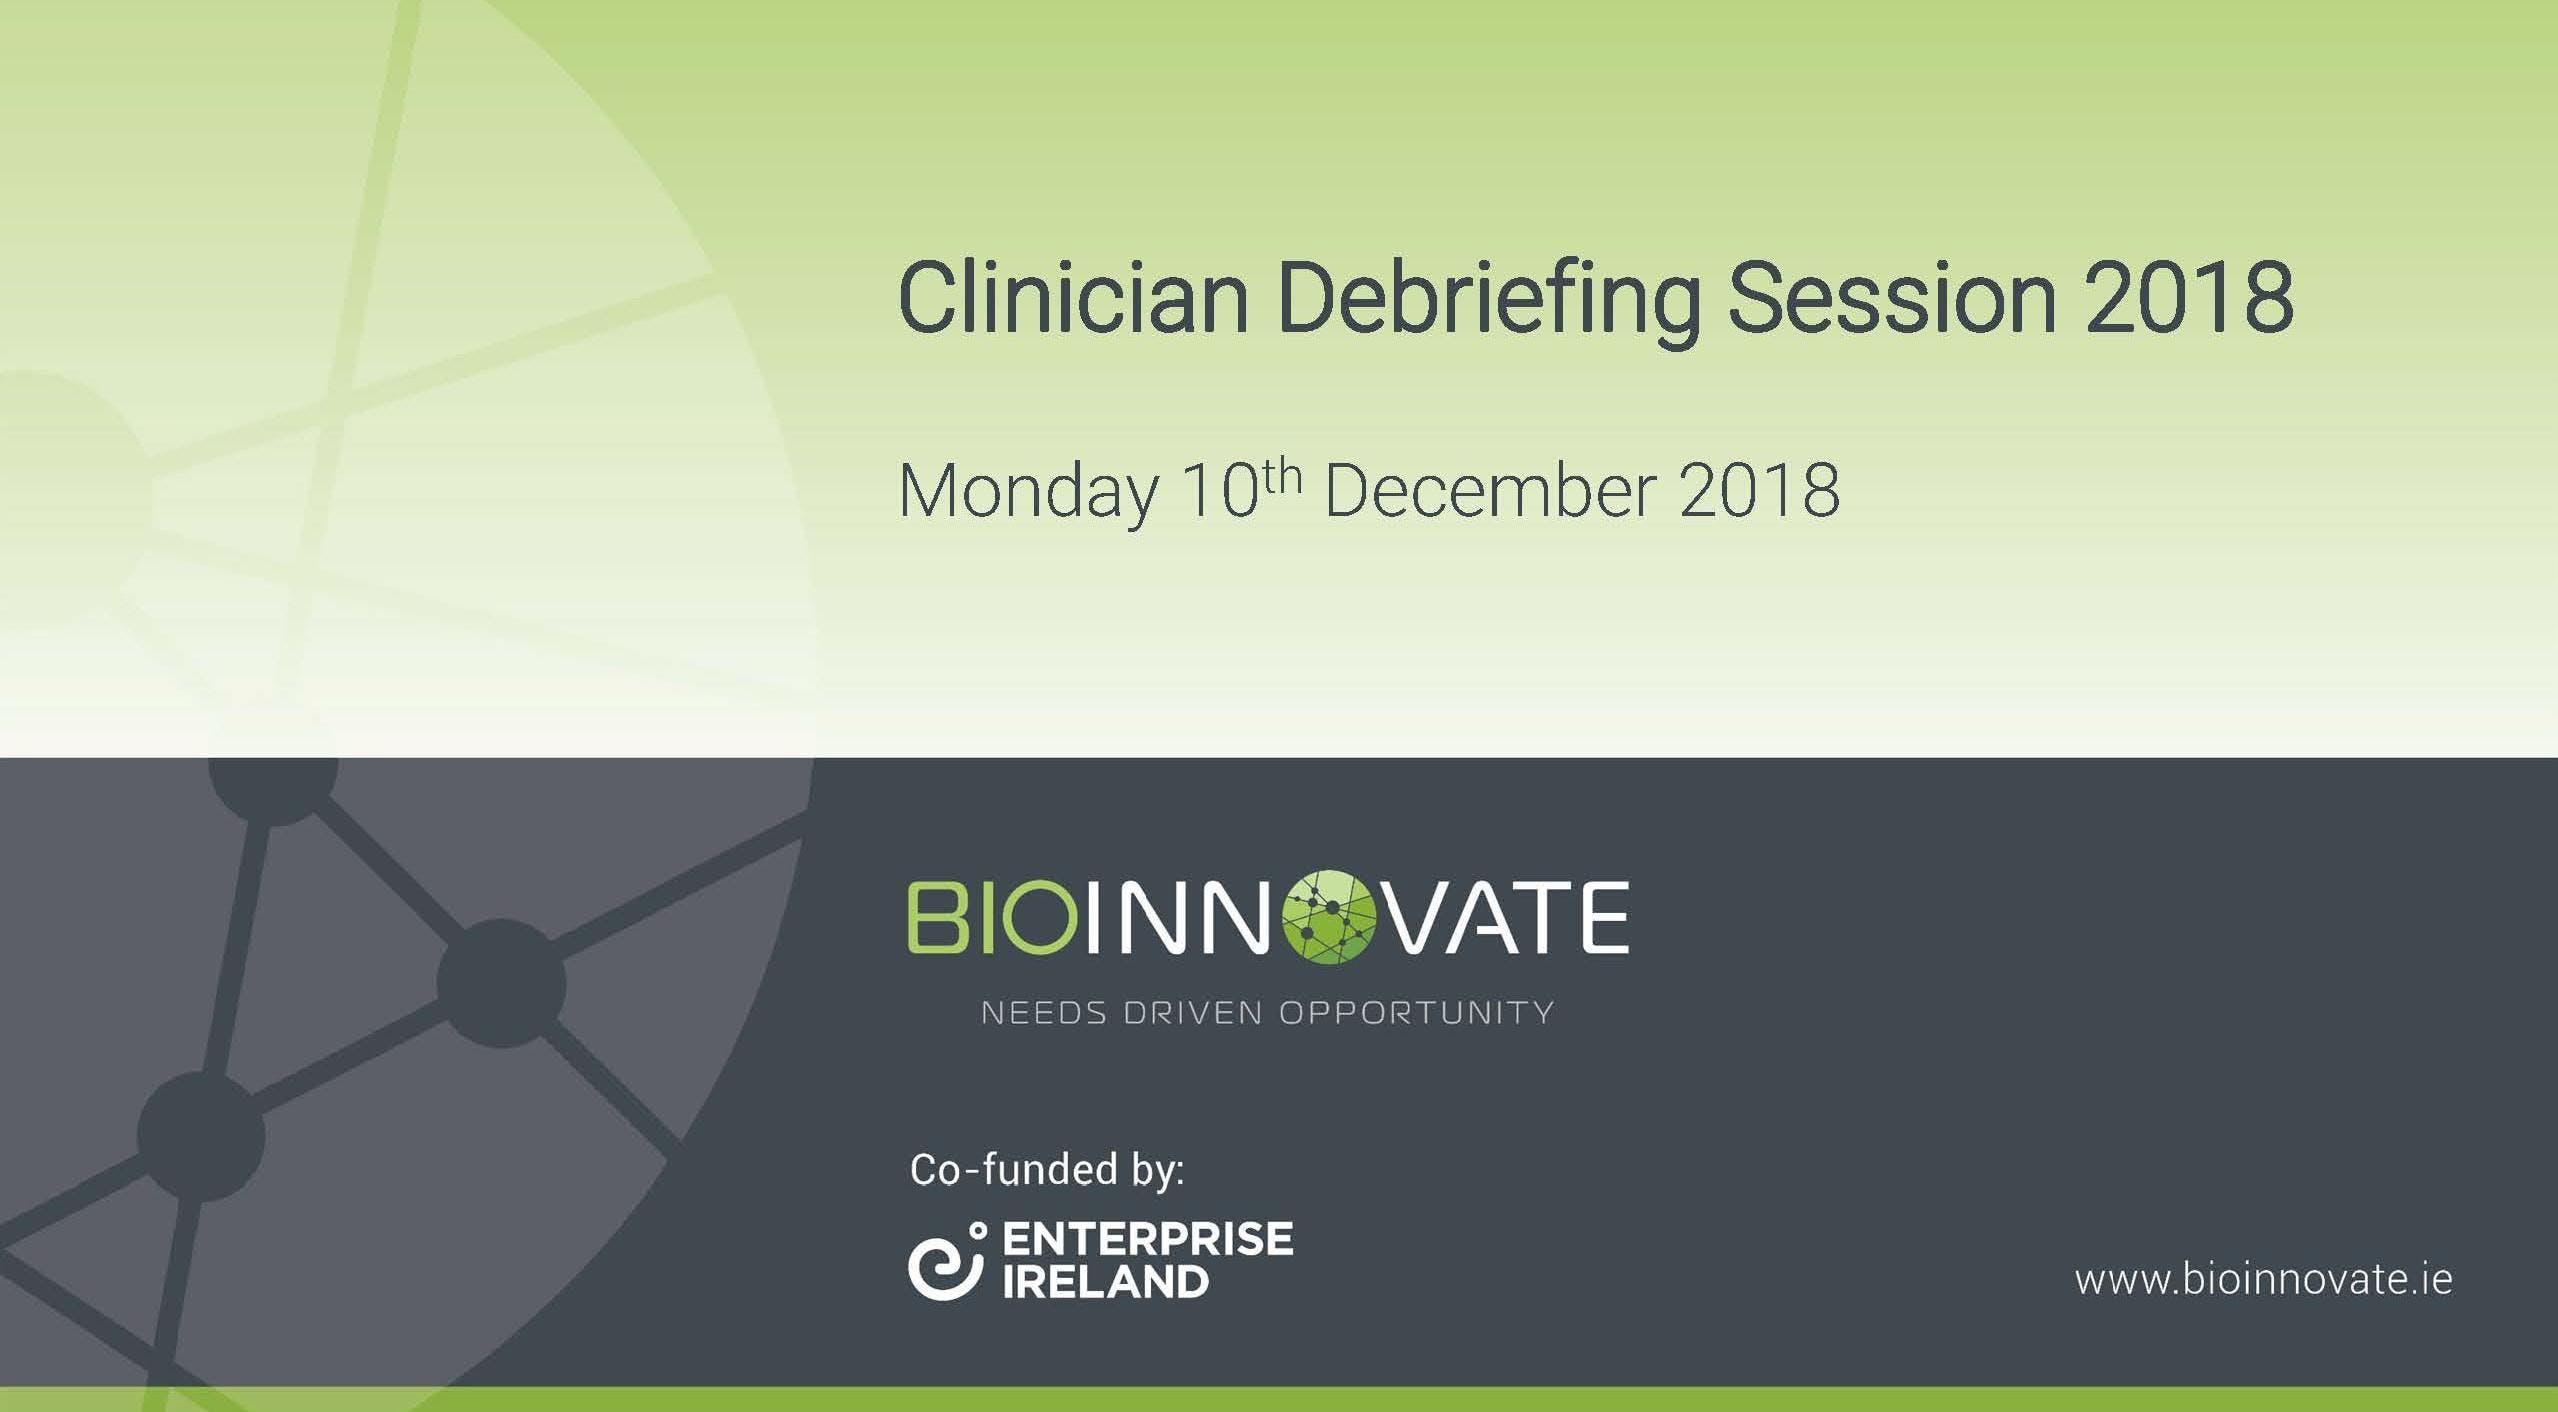 BioInnovate Clinician Breakfast Debriefing Session 2018